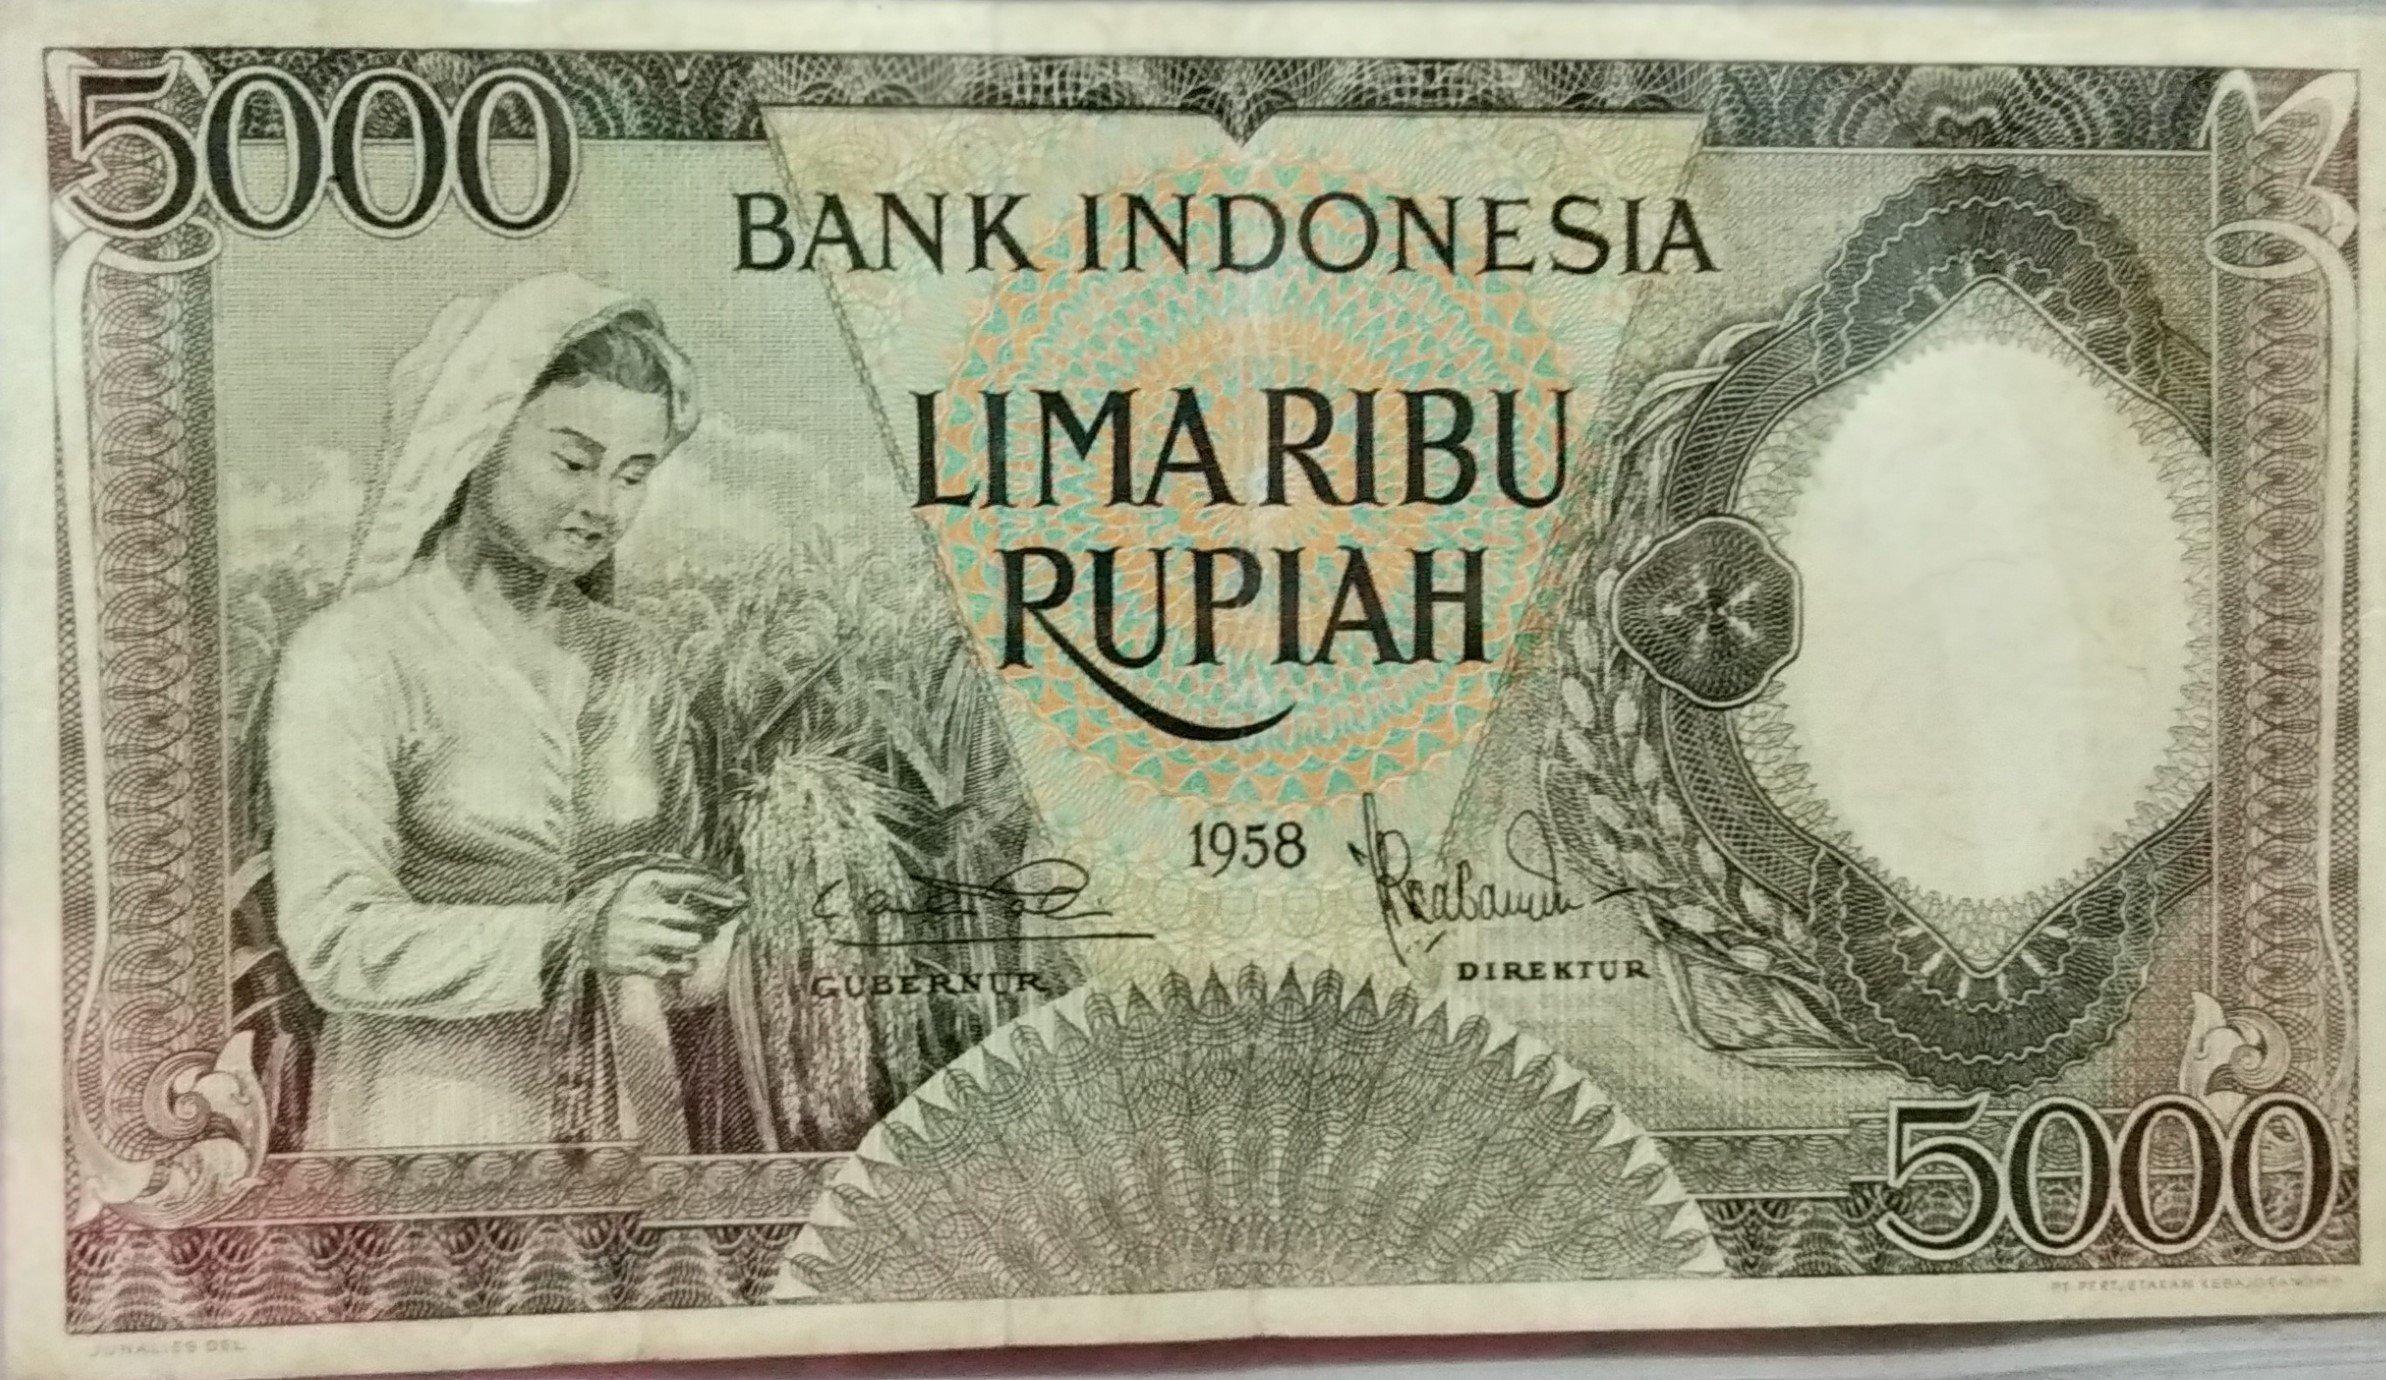 Indonesua 5000 rupiah 1958 banknote for sale